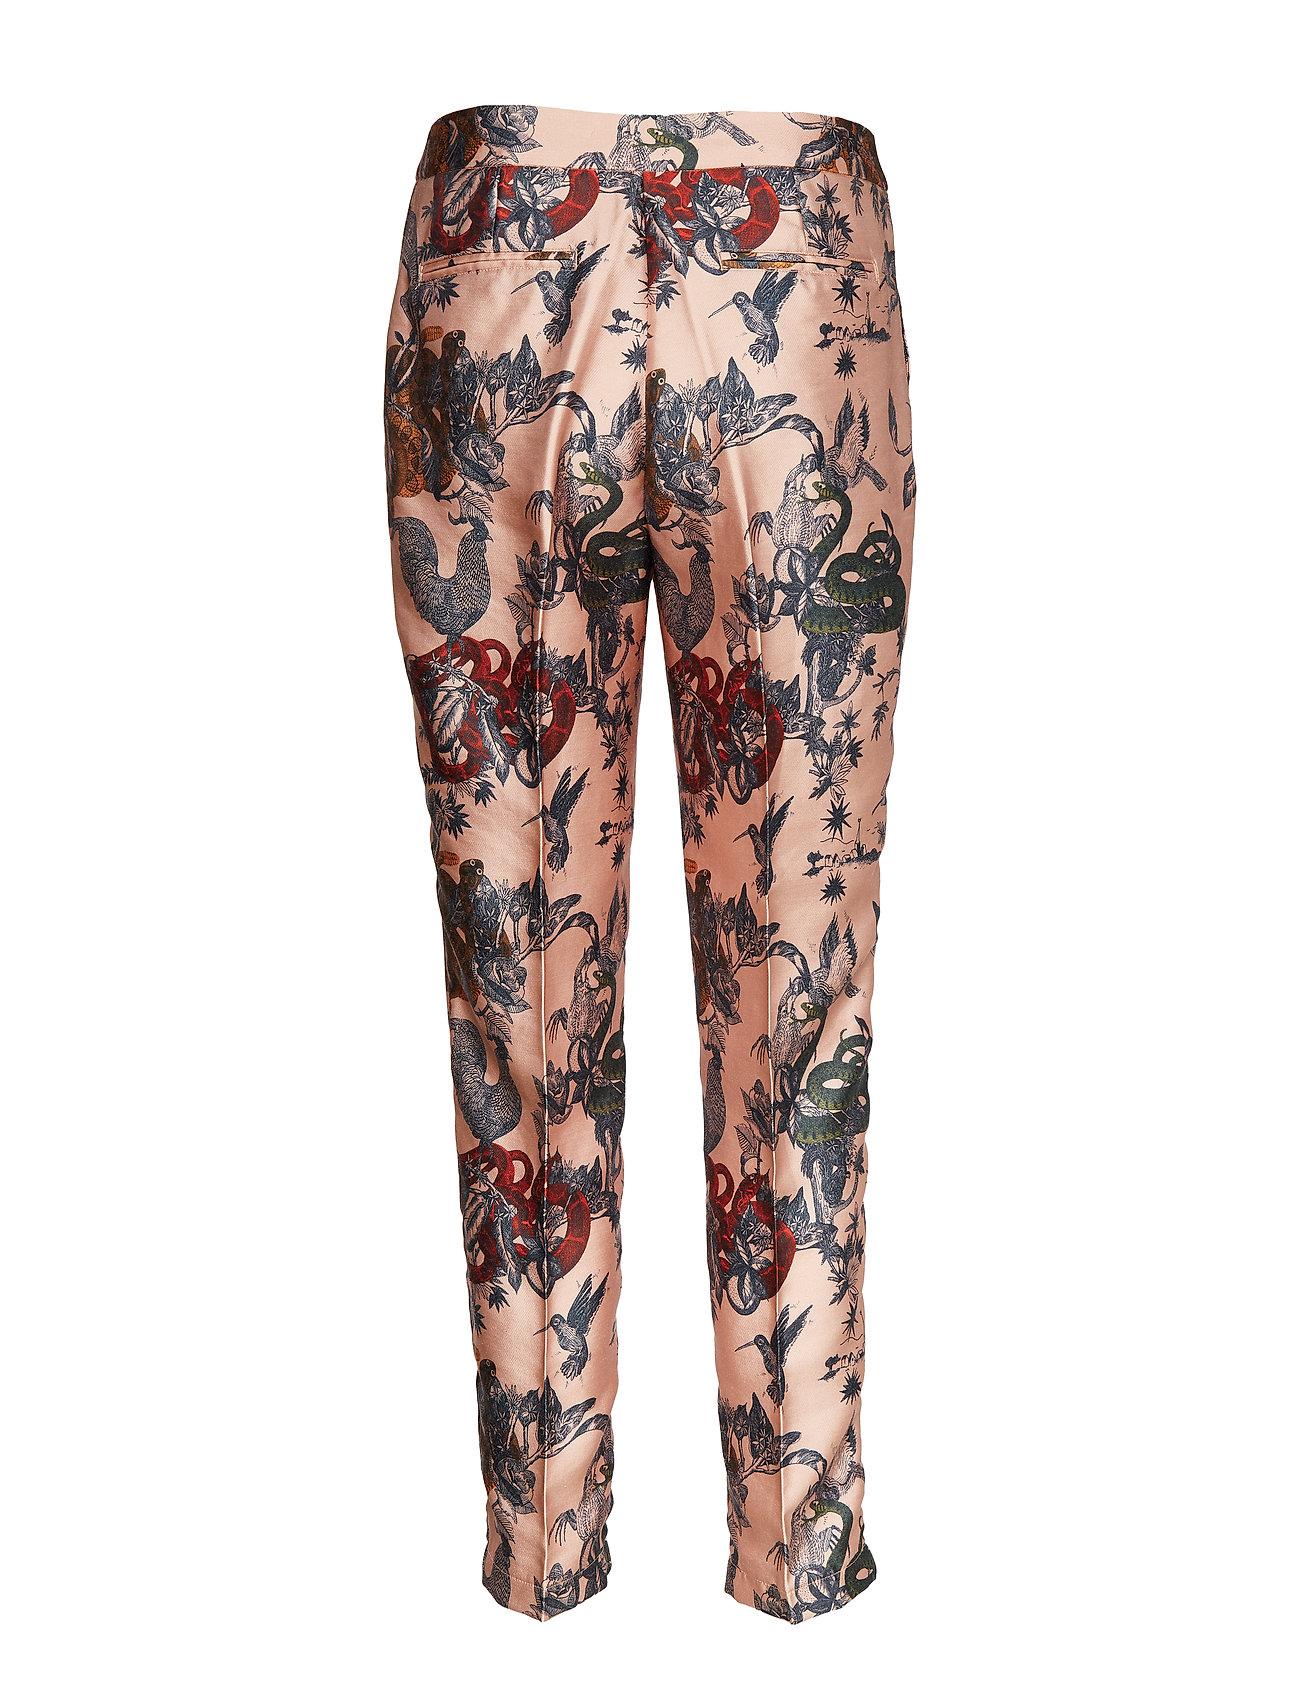 Qualitycombo Soda Printed Shiny Pants In YScotchamp; USzVjpMLqG